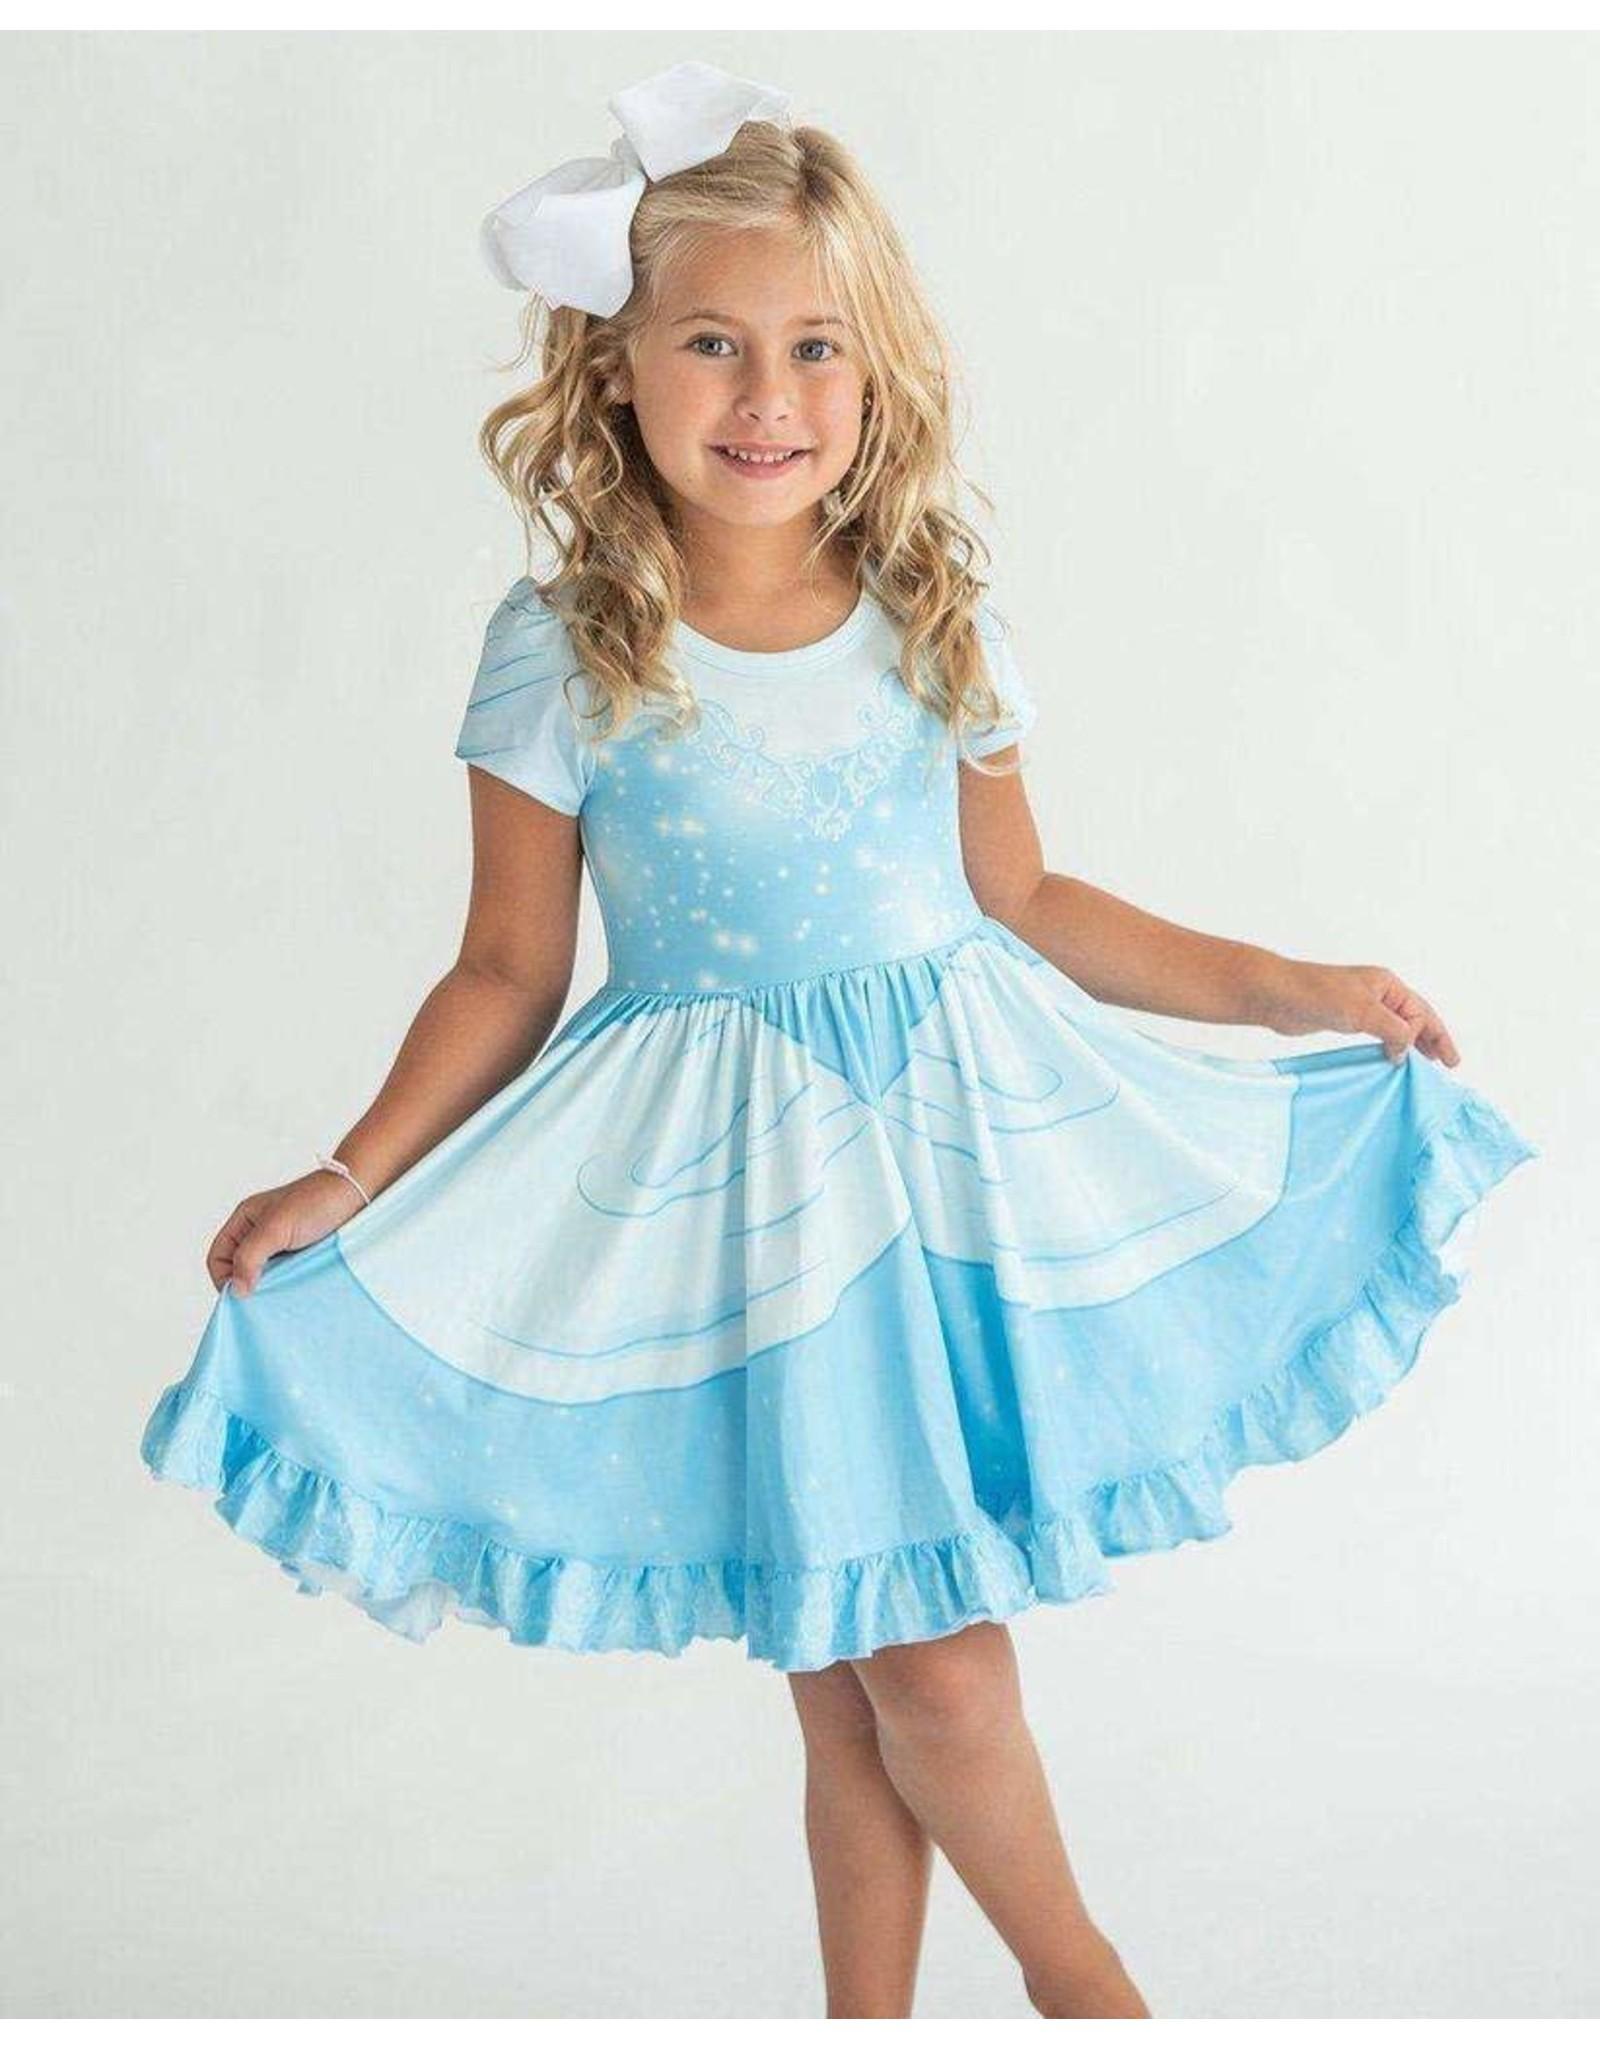 Charlies Project Charlie's Project- Cinderella Princess Soft-Tec Twirl Dress